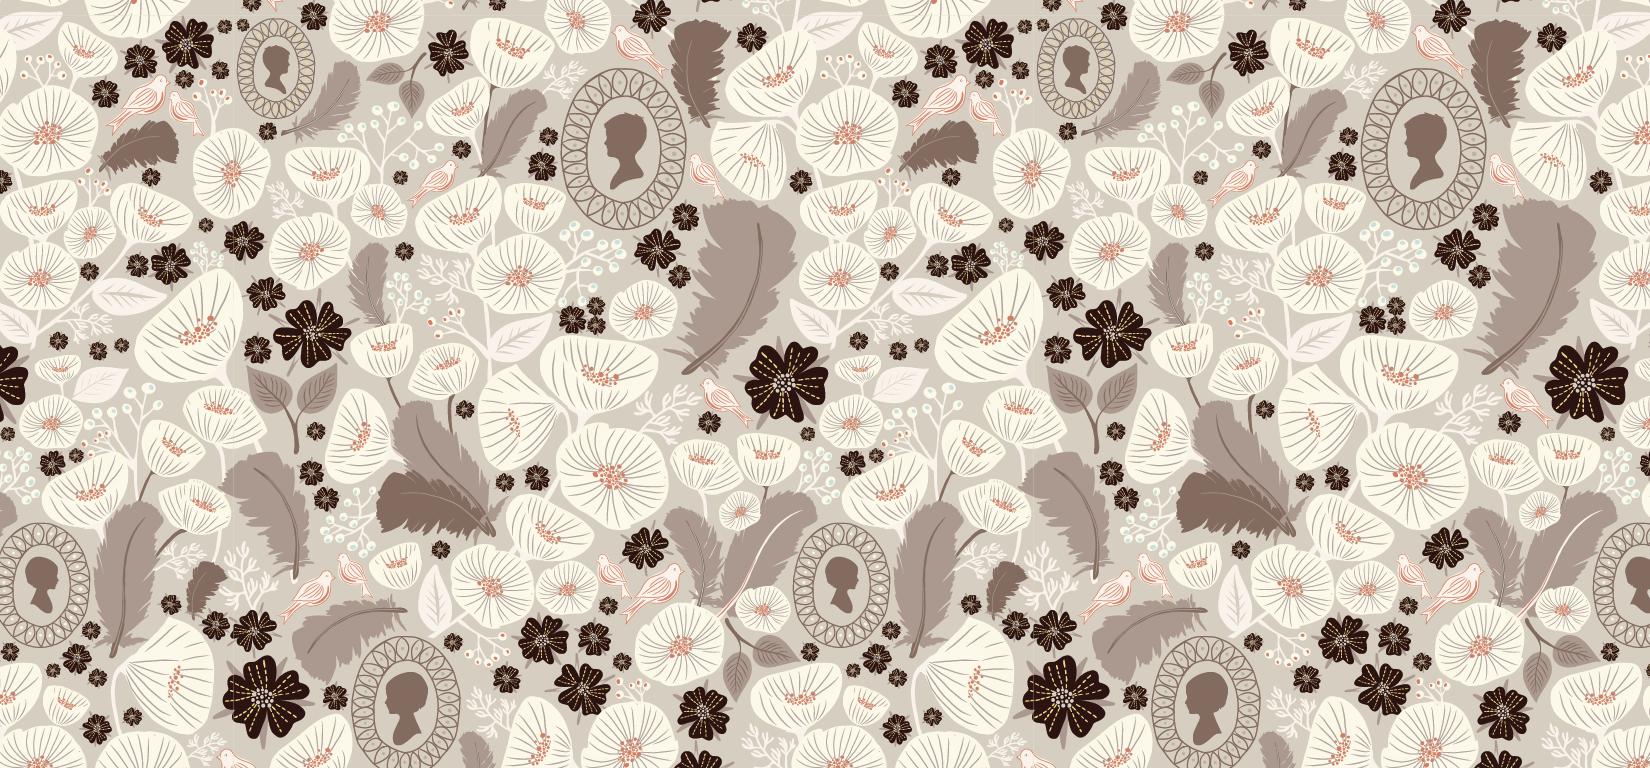 elena-wilken-wild-flower-fields-surface-pattern-design1.png